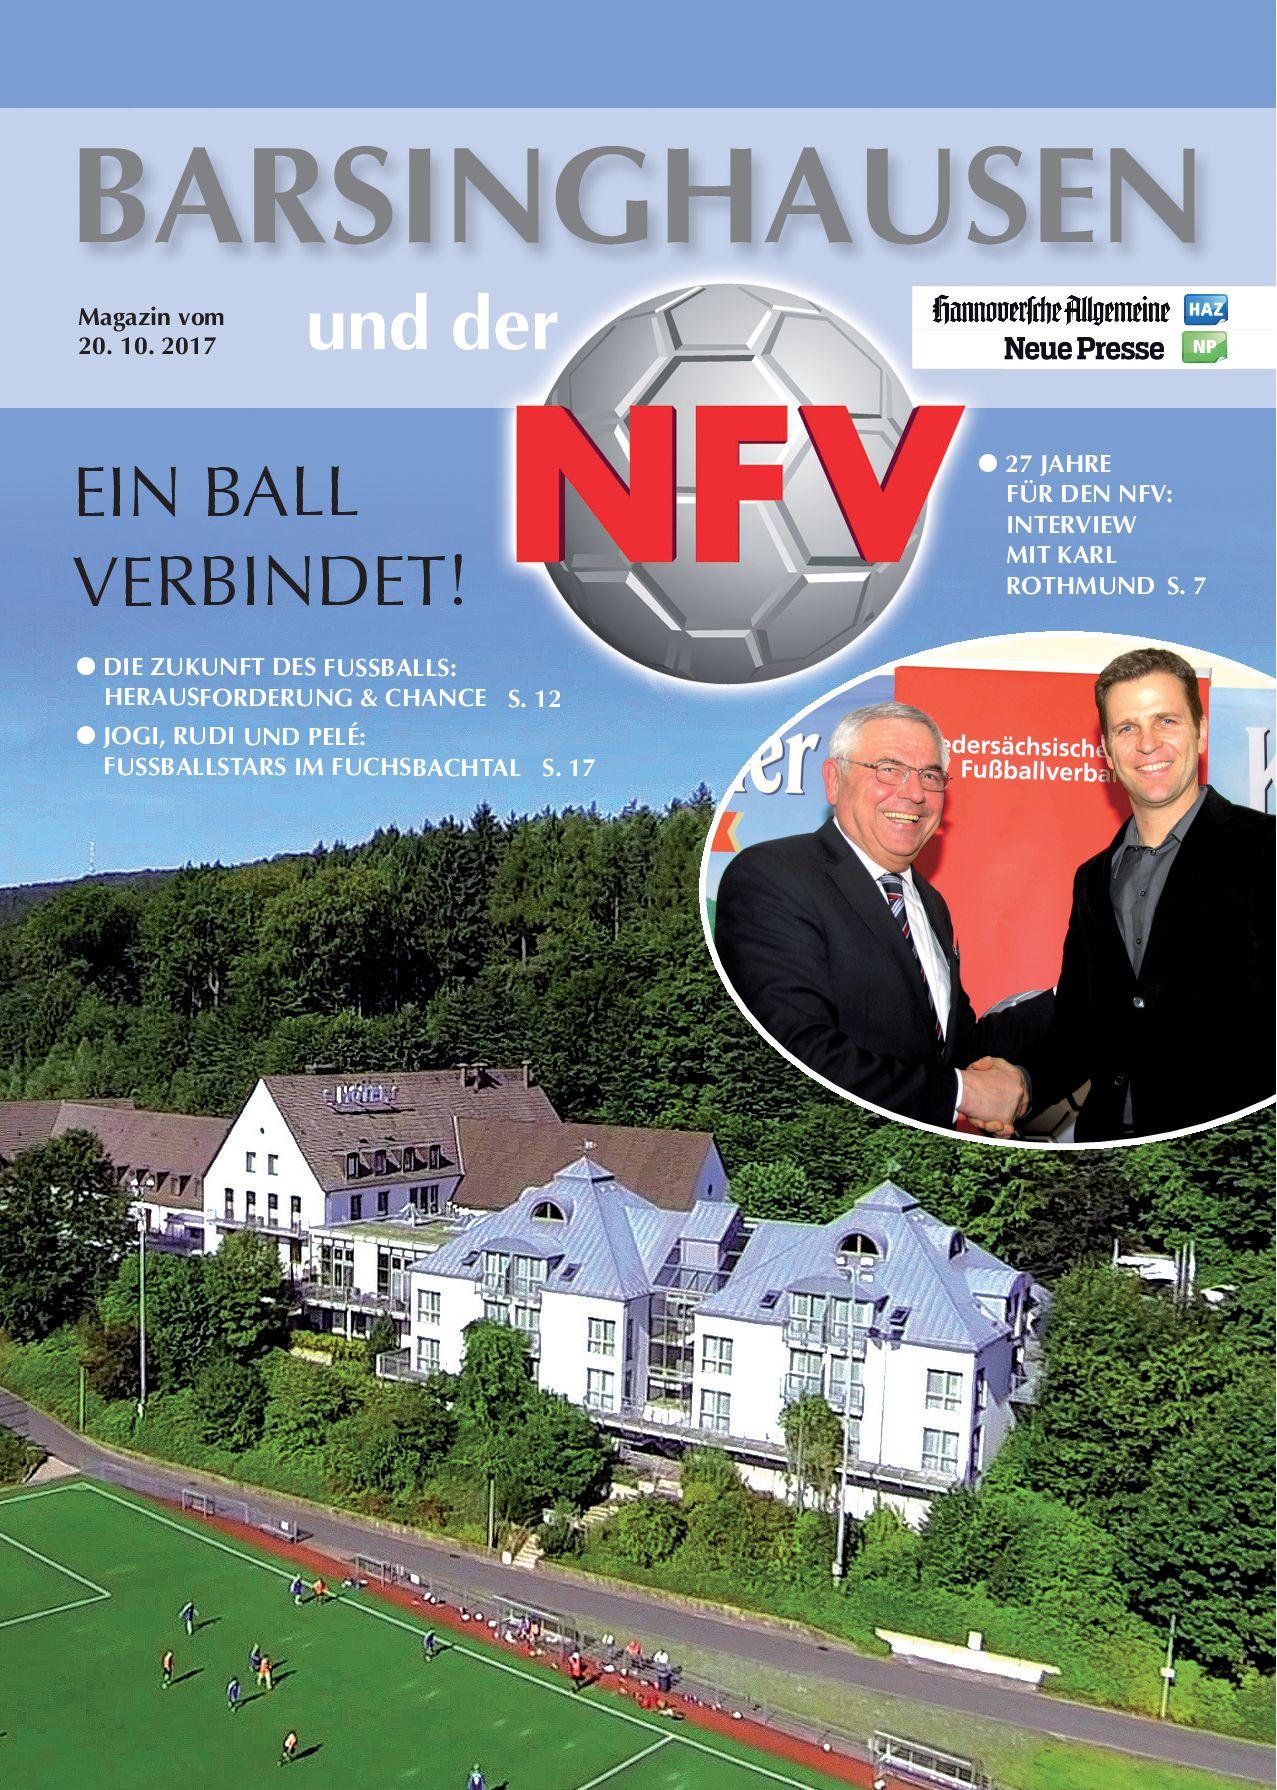 barsinghausen-nr-7-vom-20-10-2017